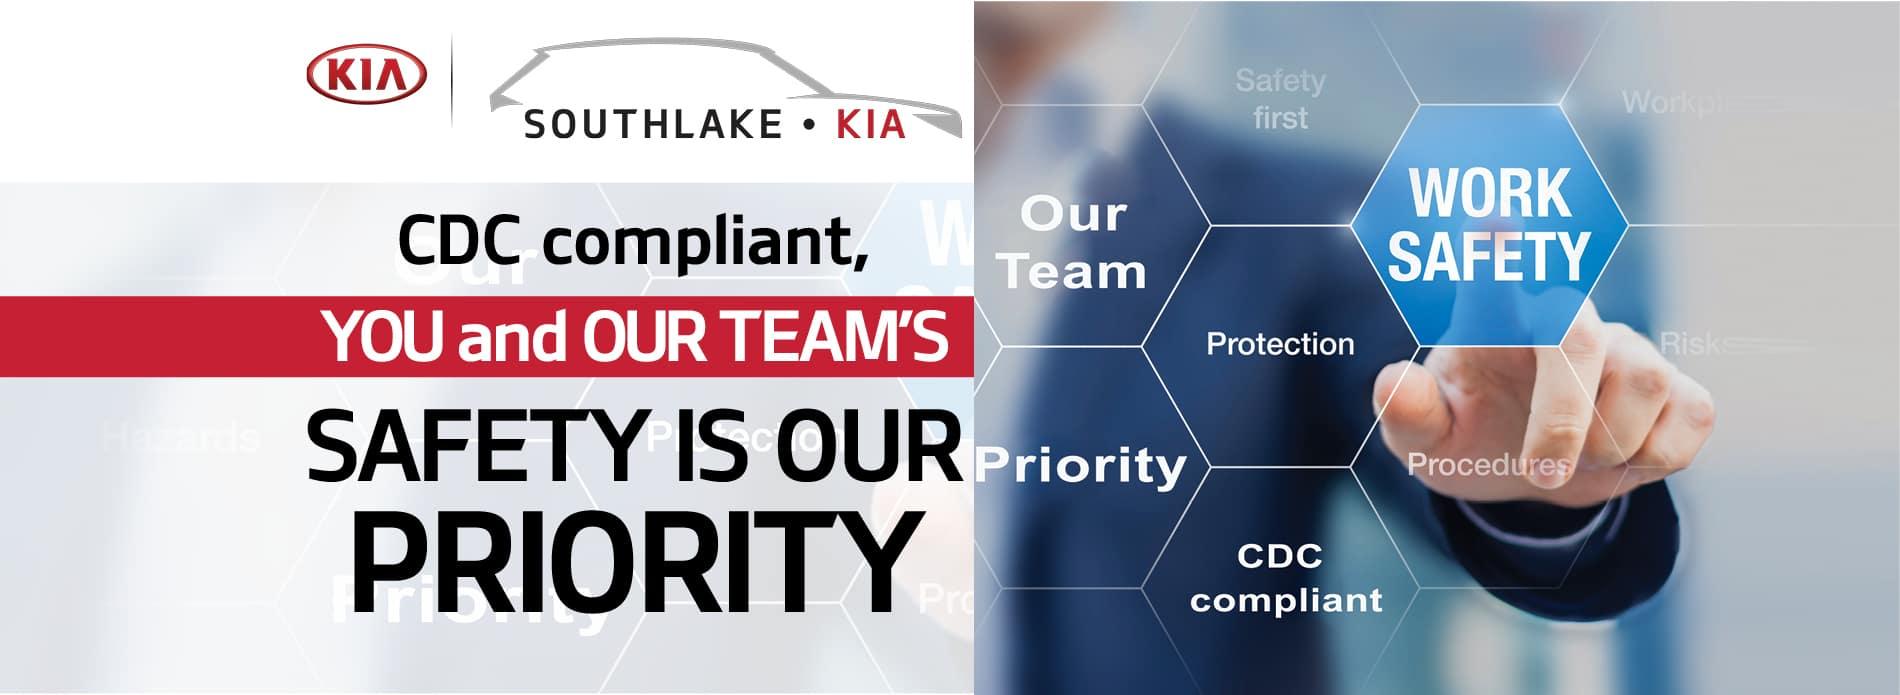 CDC Compliant | Southlake Kia